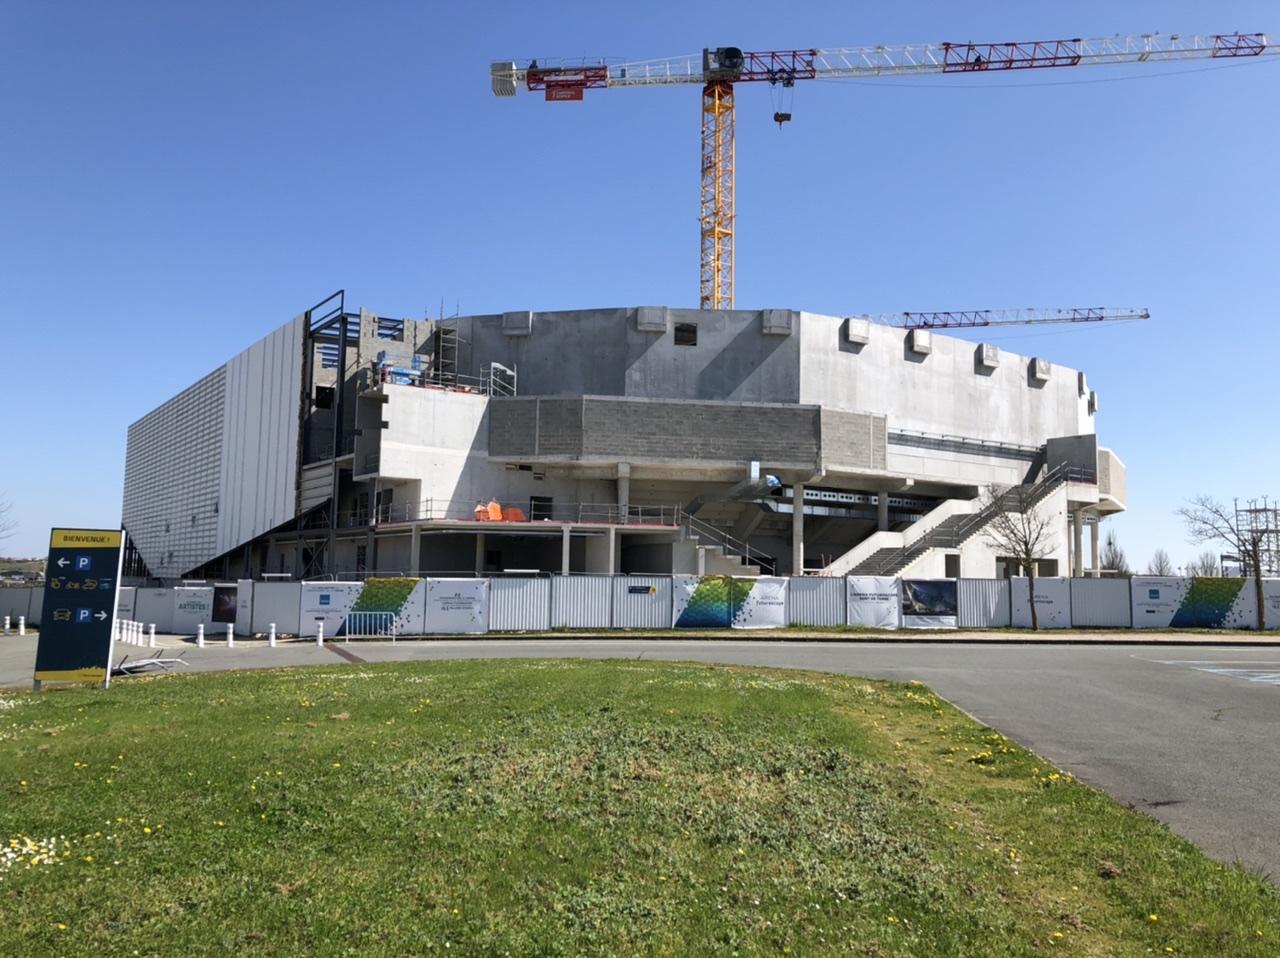 « Arena Futuroscope » grande salle de spectacles et de sports · 2022 - Page 17 86-D030-FB-84-D0-47-AC-B206-F9958490-FFDD